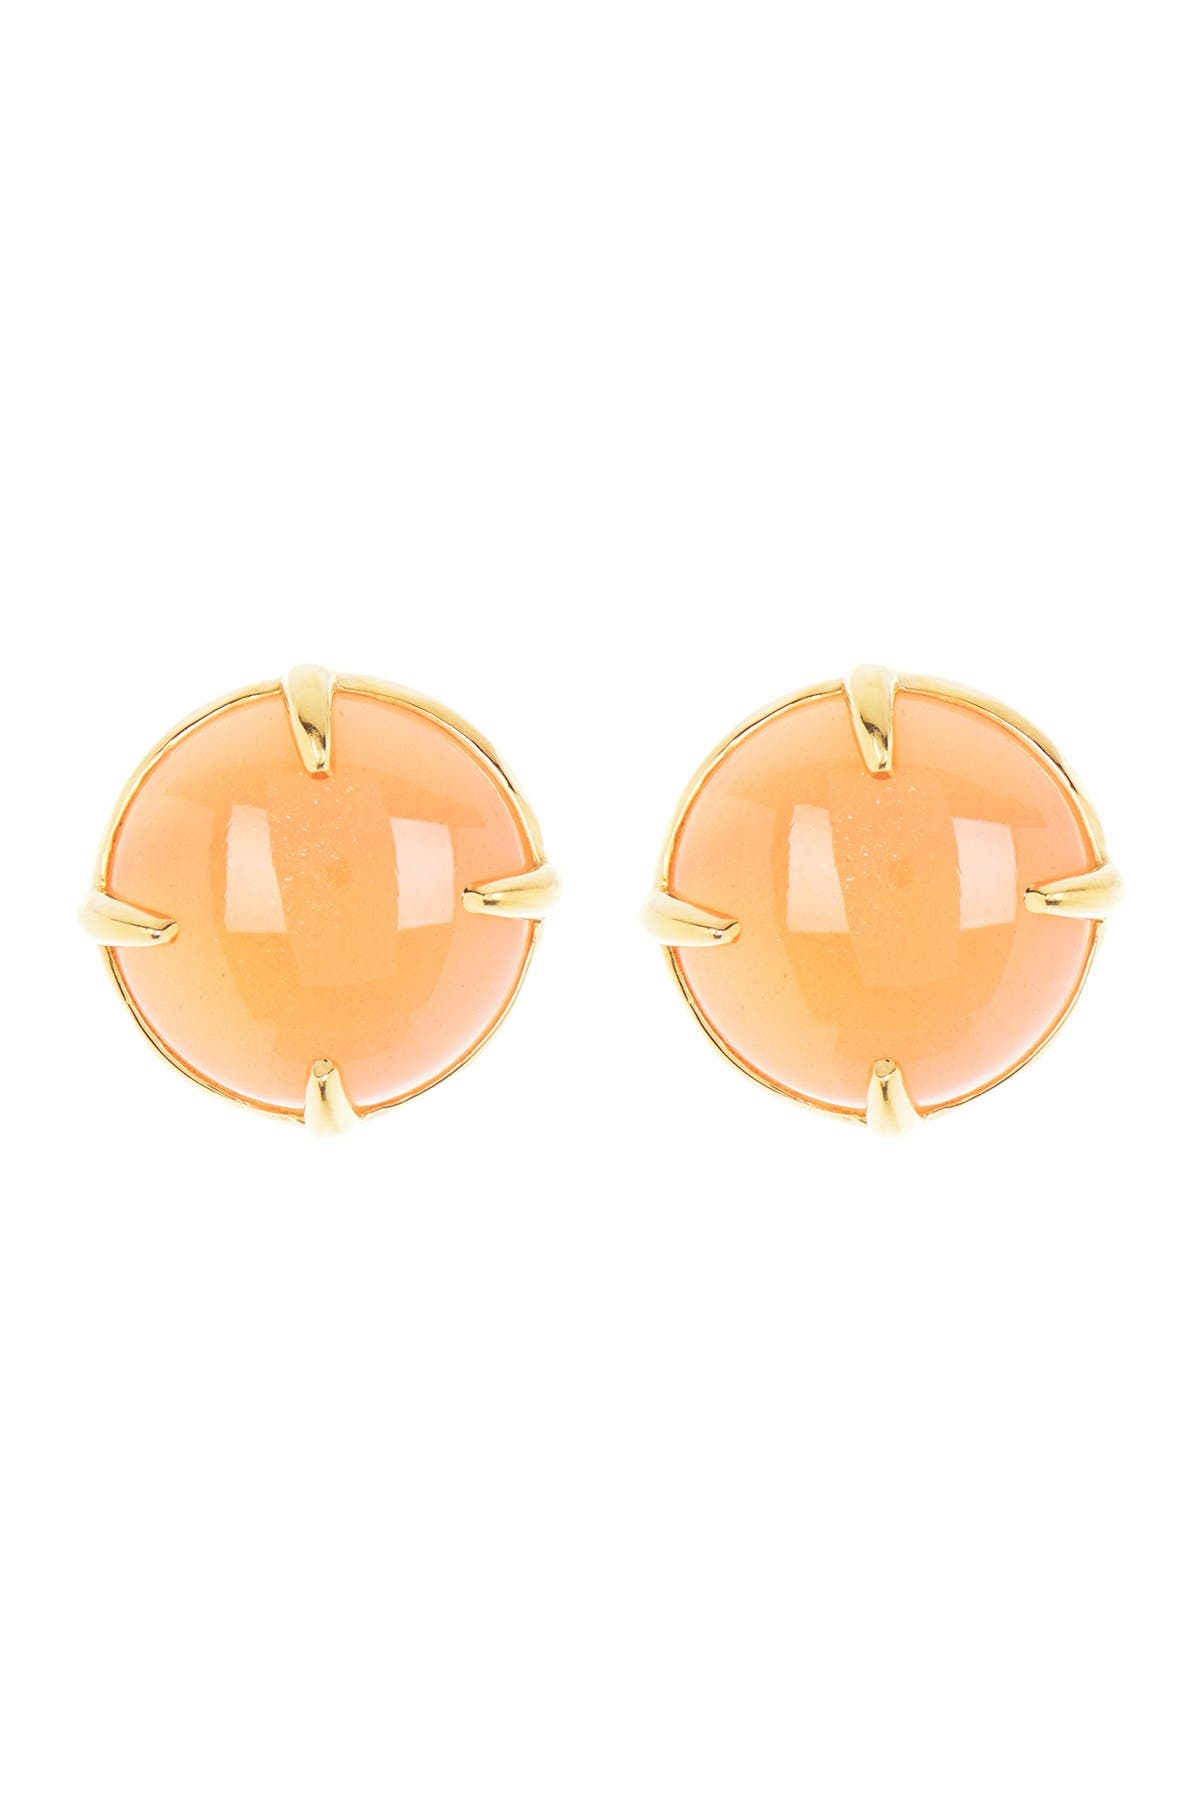 Image of Ippolita Lollipop 18K Gold Mini Stud Earrings